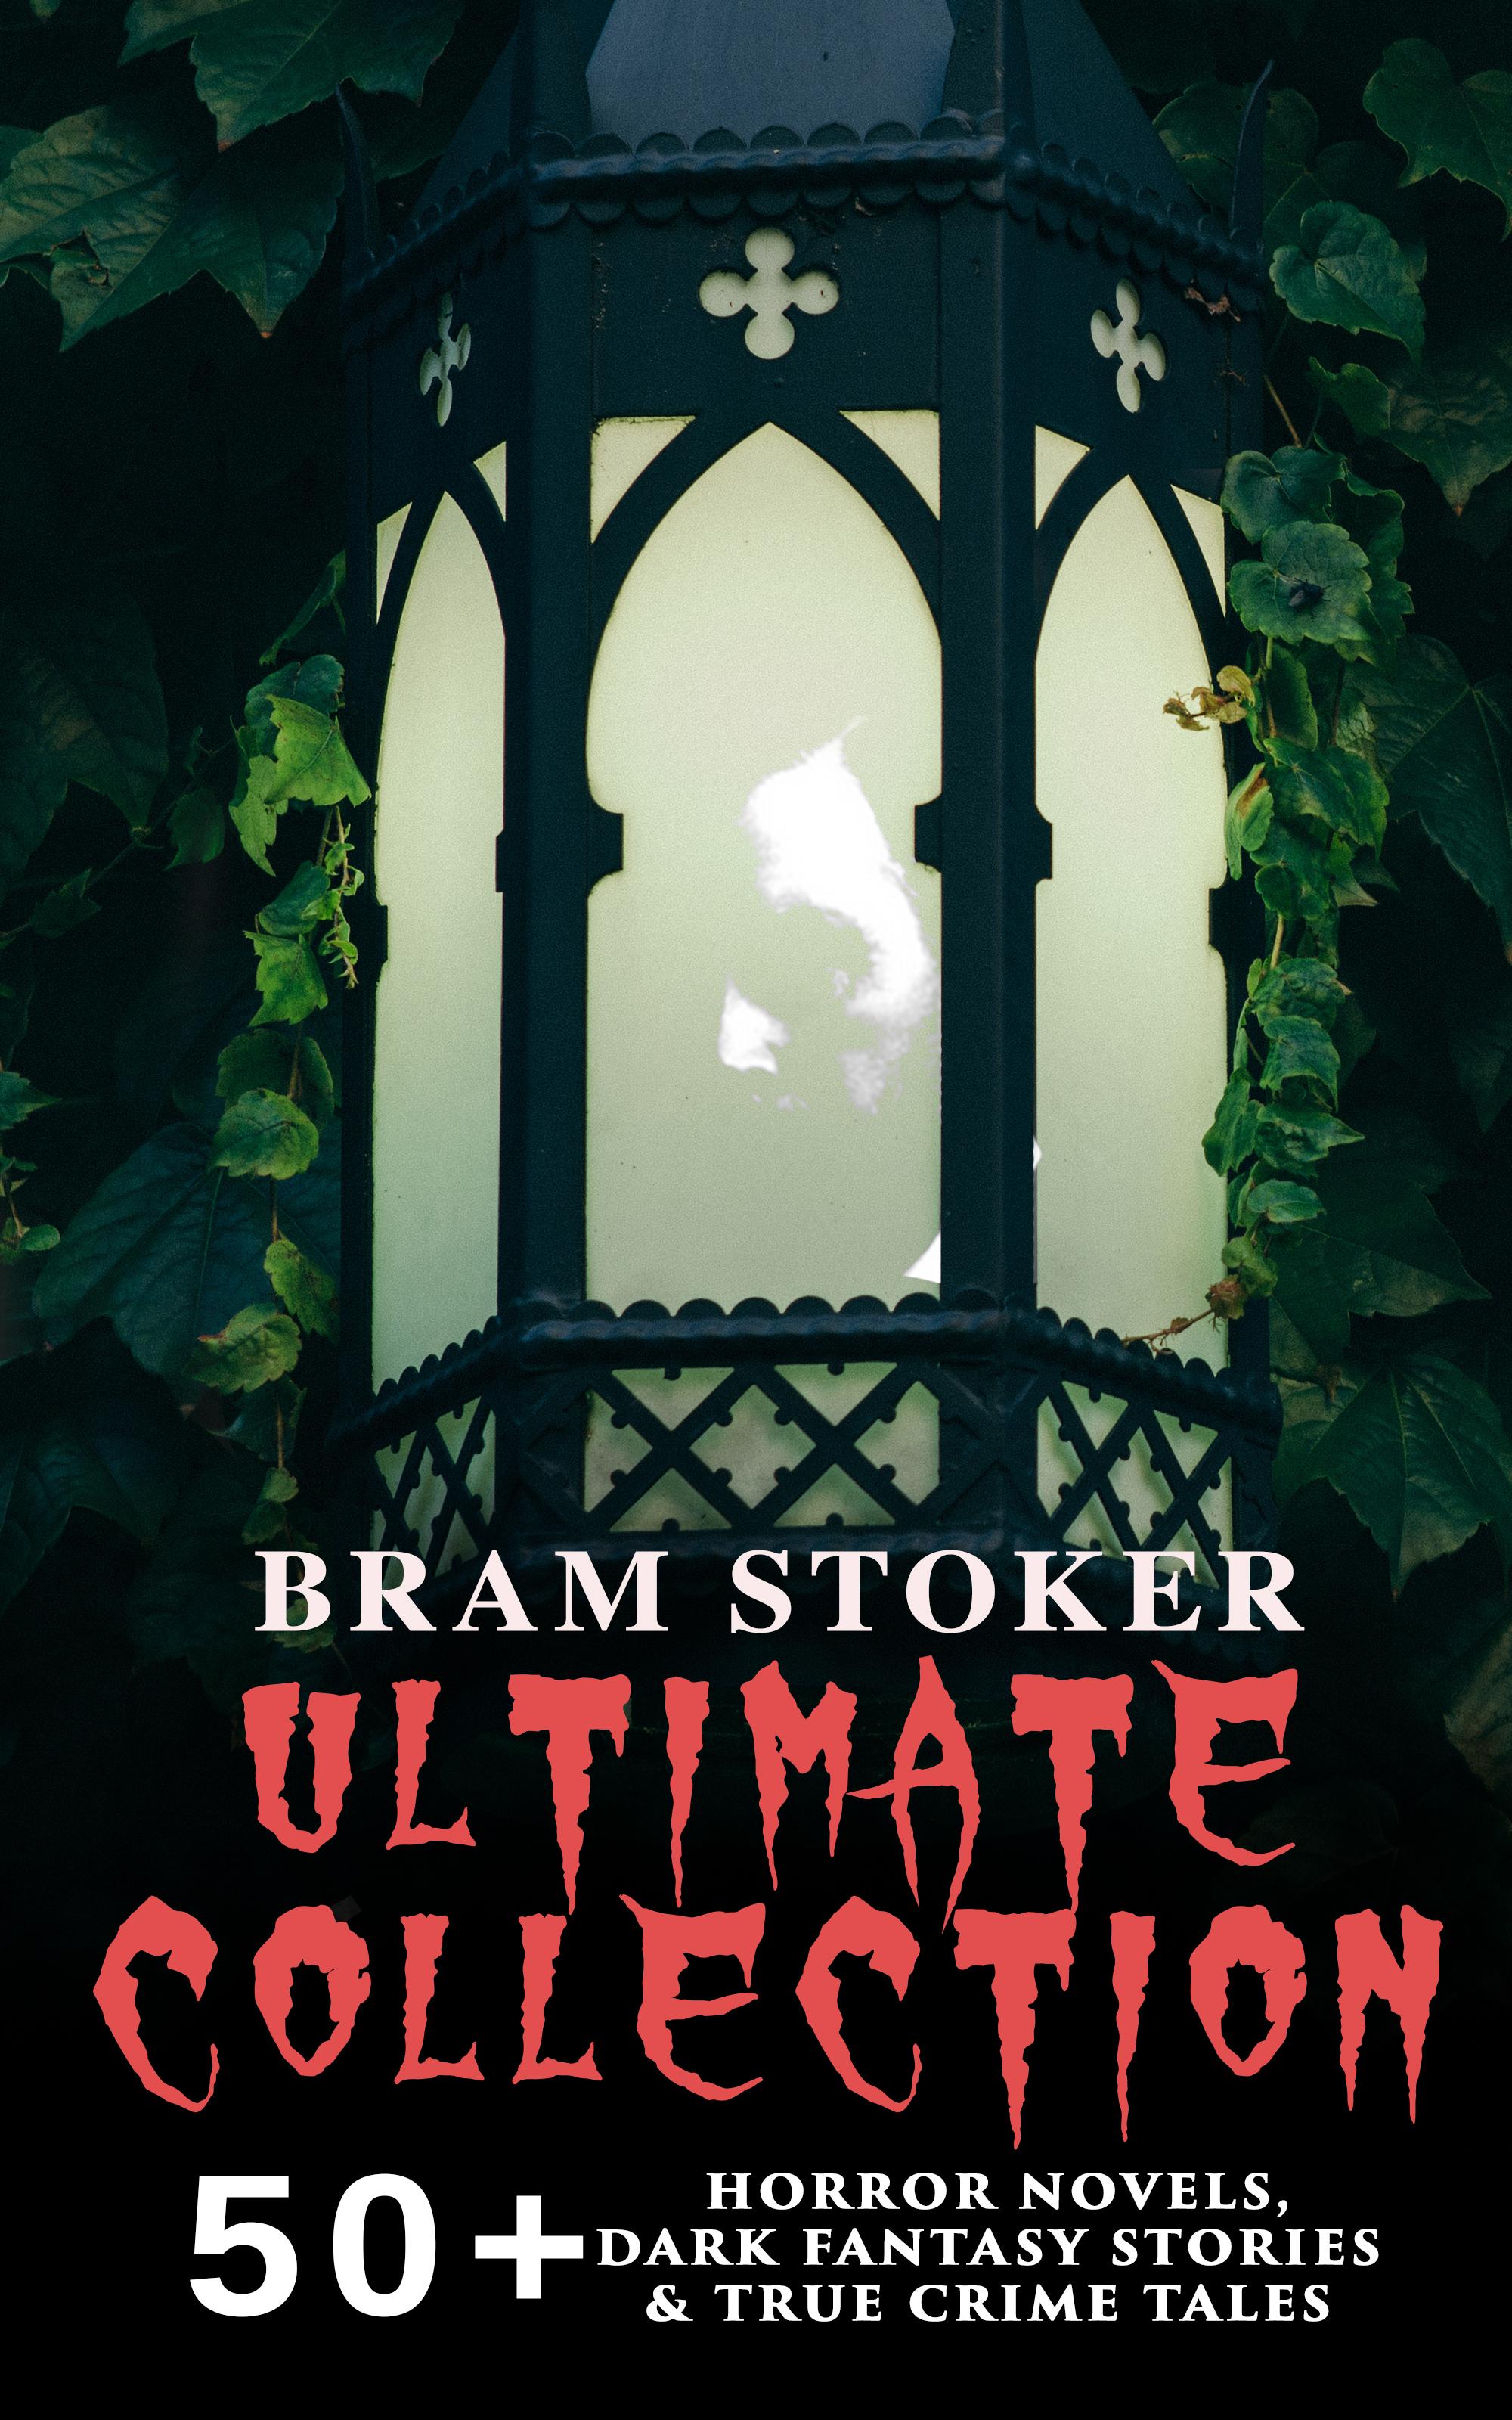 bram stoker ultimate collection 50 horror novels dark fantasy stories true crime tales